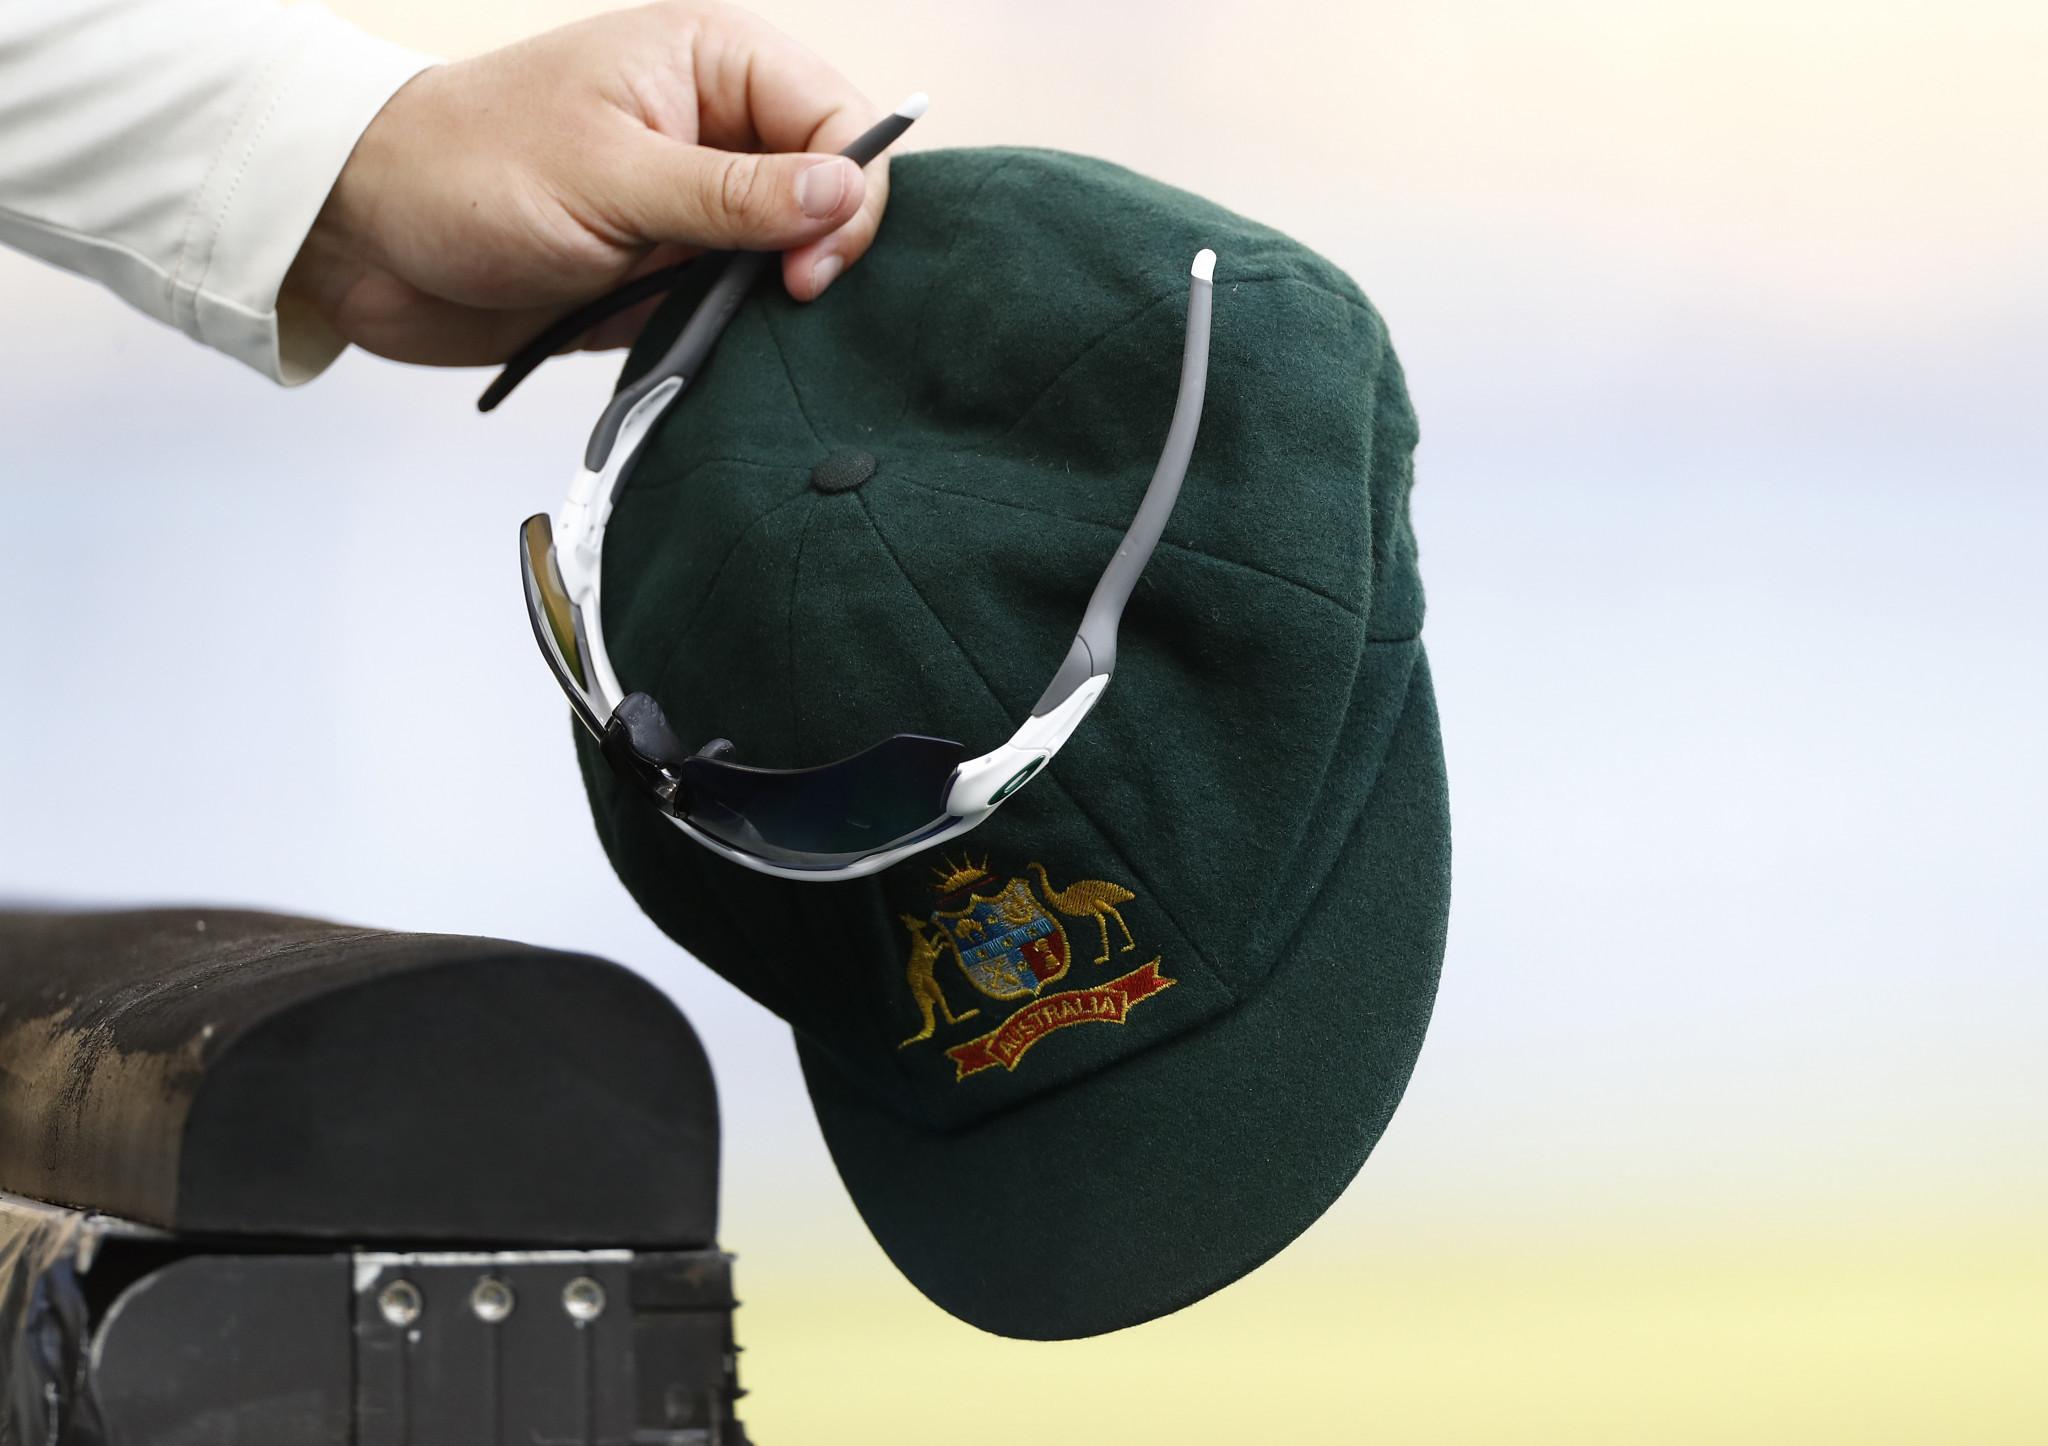 Cricket Australia cuts 40 more jobs as coronavirus continues to bite